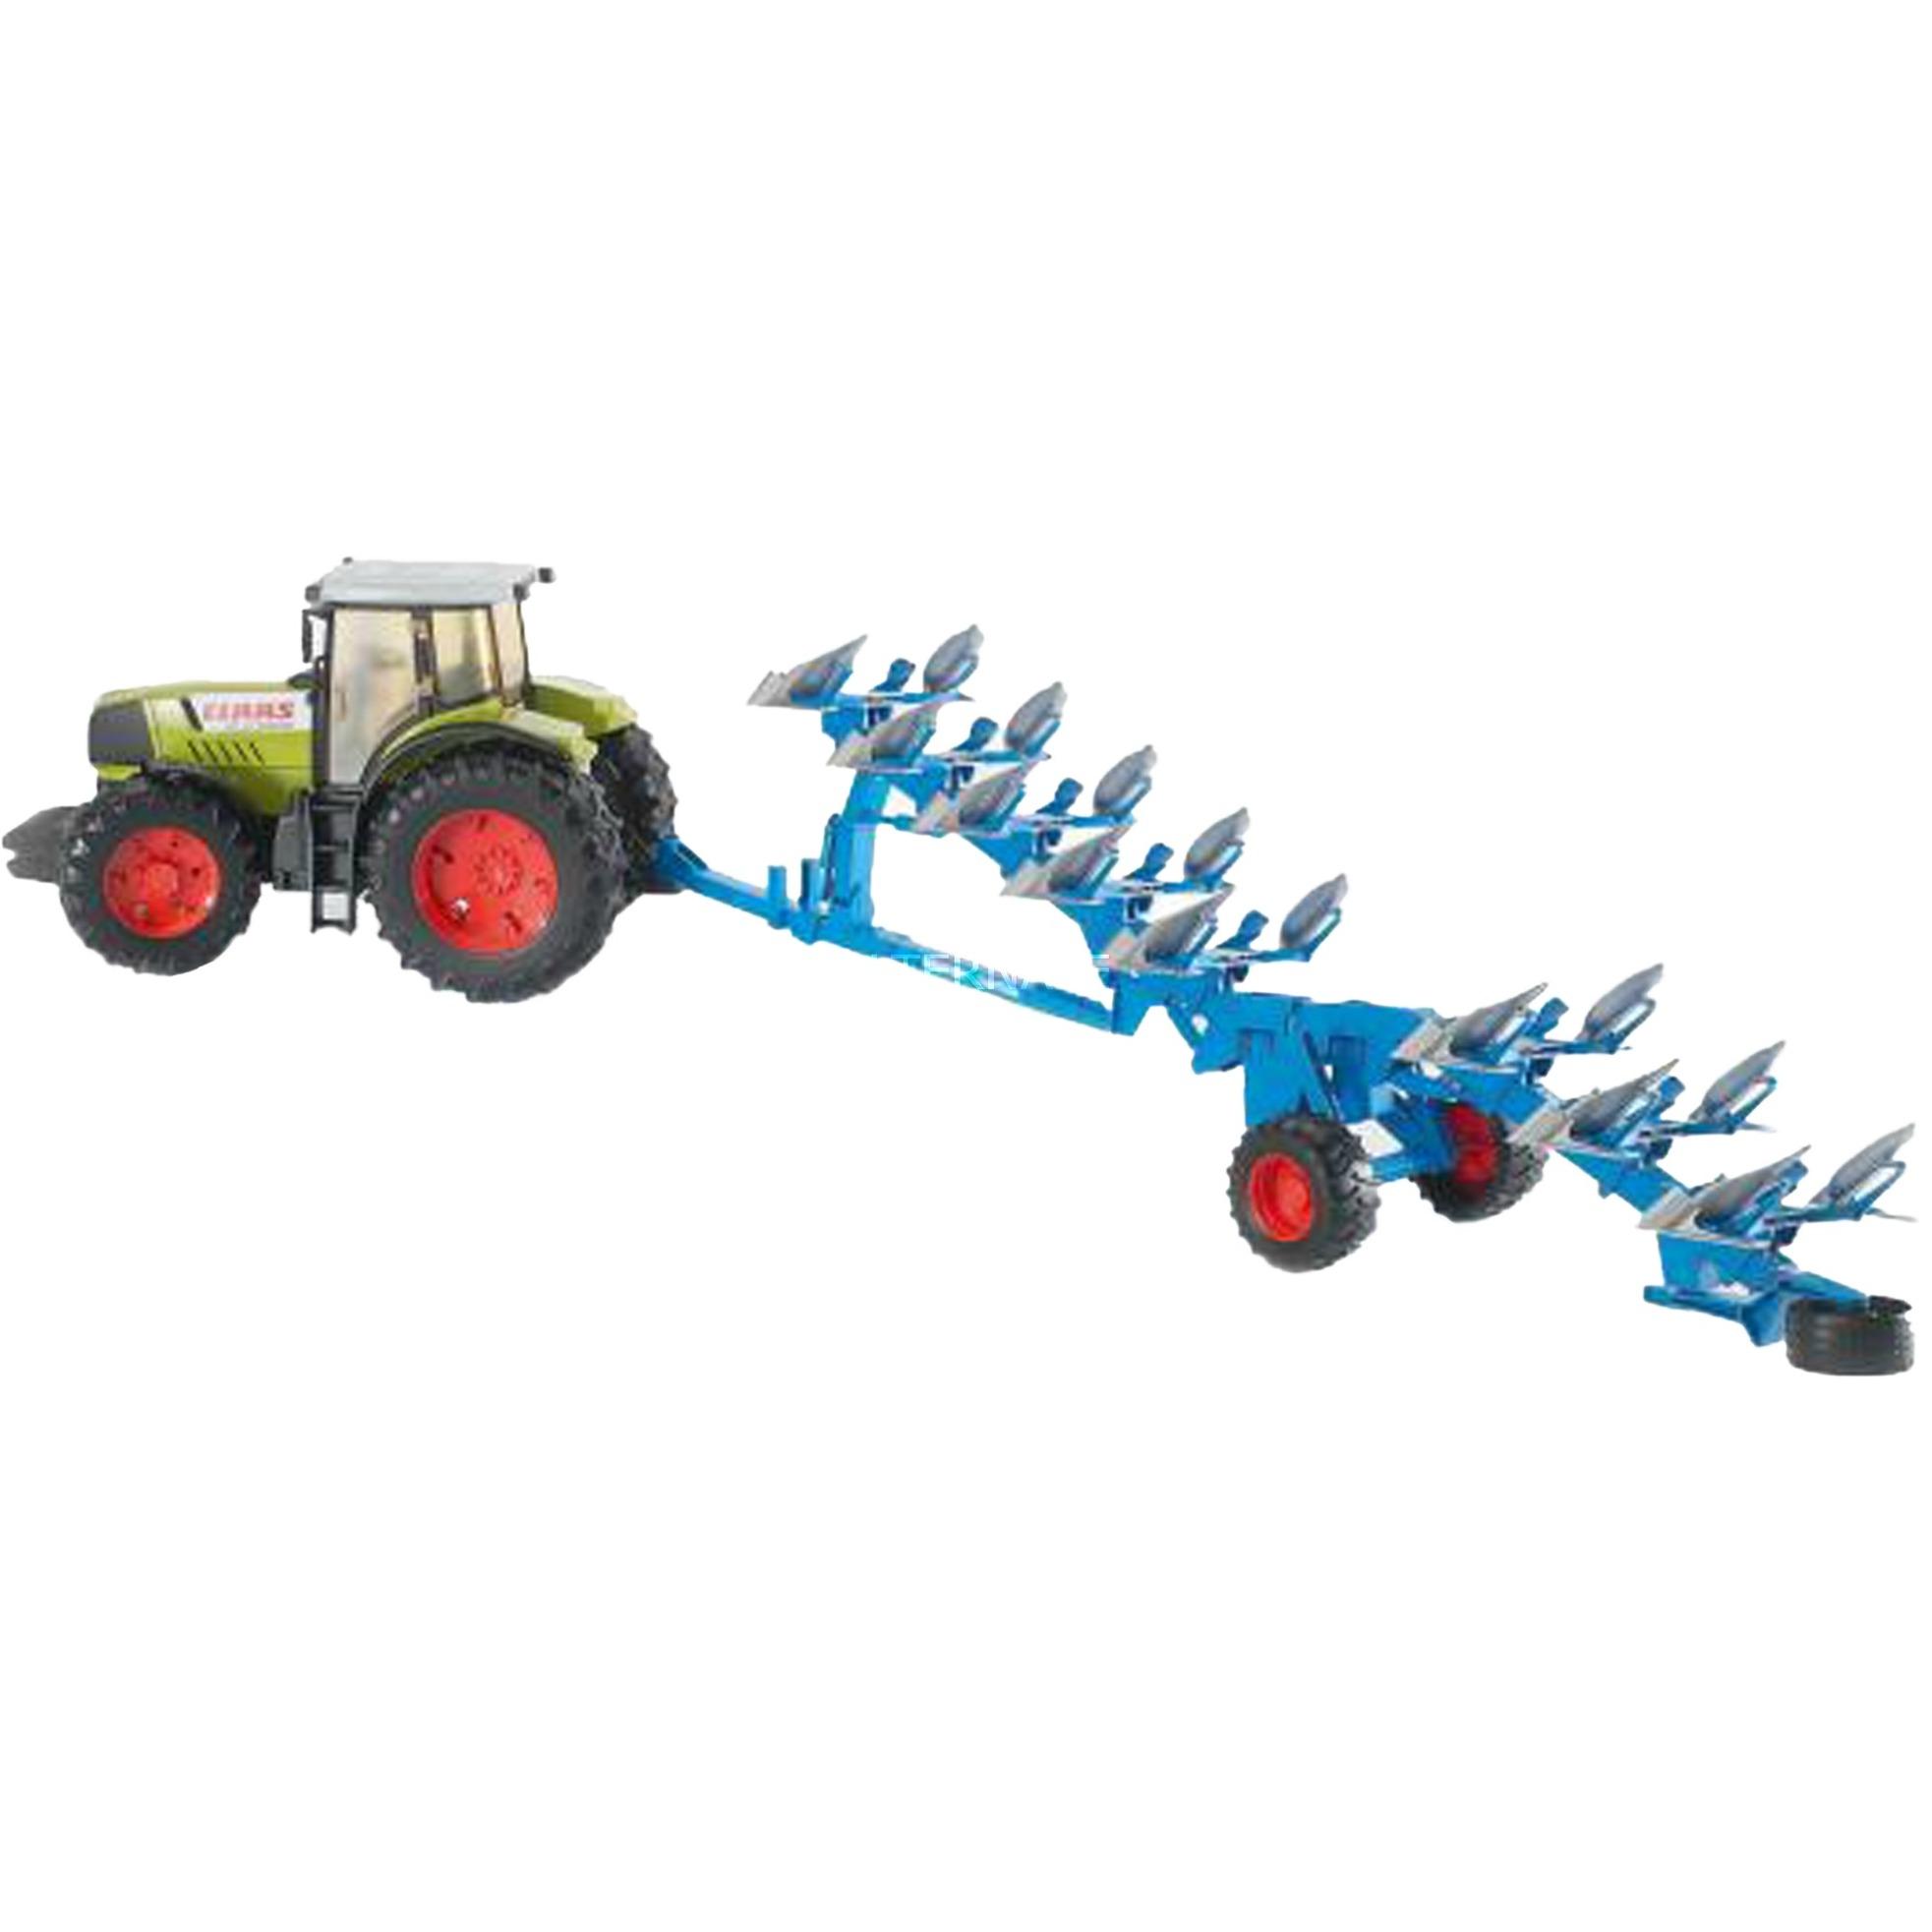 02250 Previamente montado Modelo a escala de tractor 1:16 modelo de vehículo de tierra, Automóvil de construcción